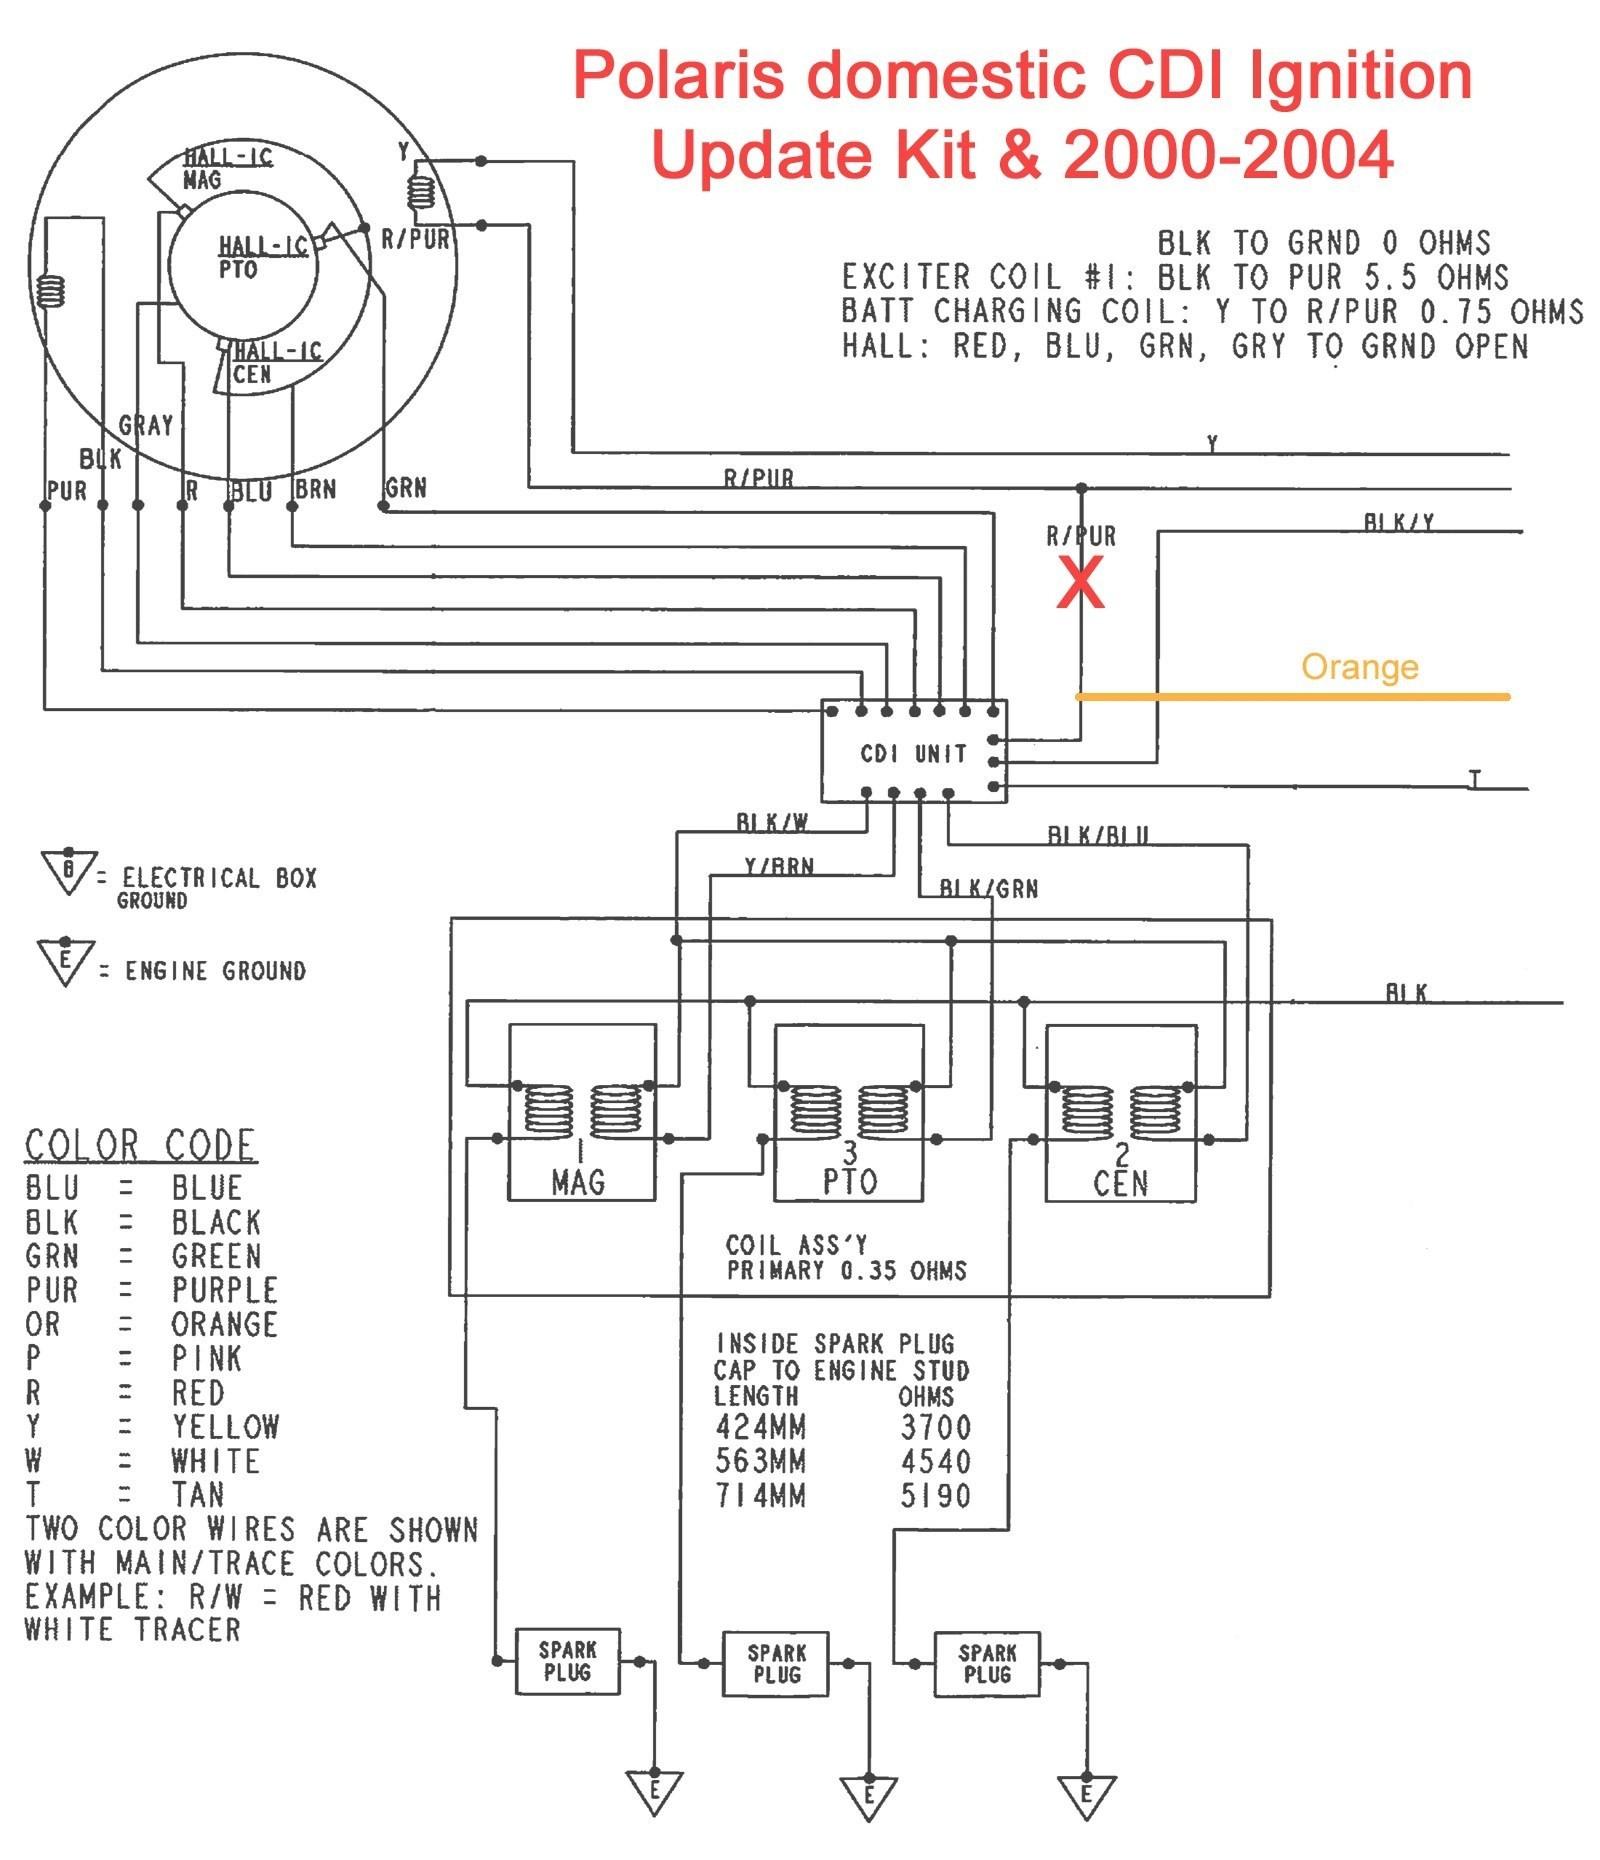 Gy 2000 2000 Polaris Magnum 325 Wiring Diagram Download